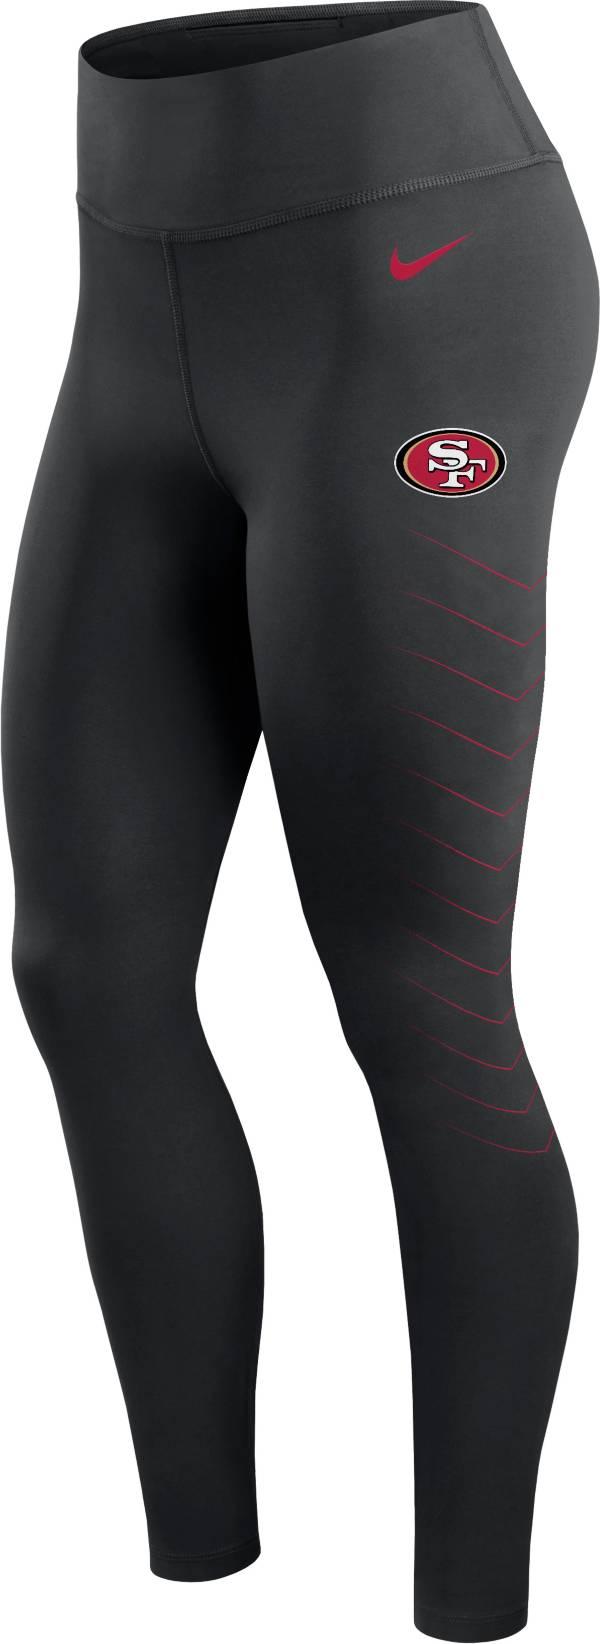 Nike Women's San Francisco 49ers Dri-FIT Black Performance Leggings product image